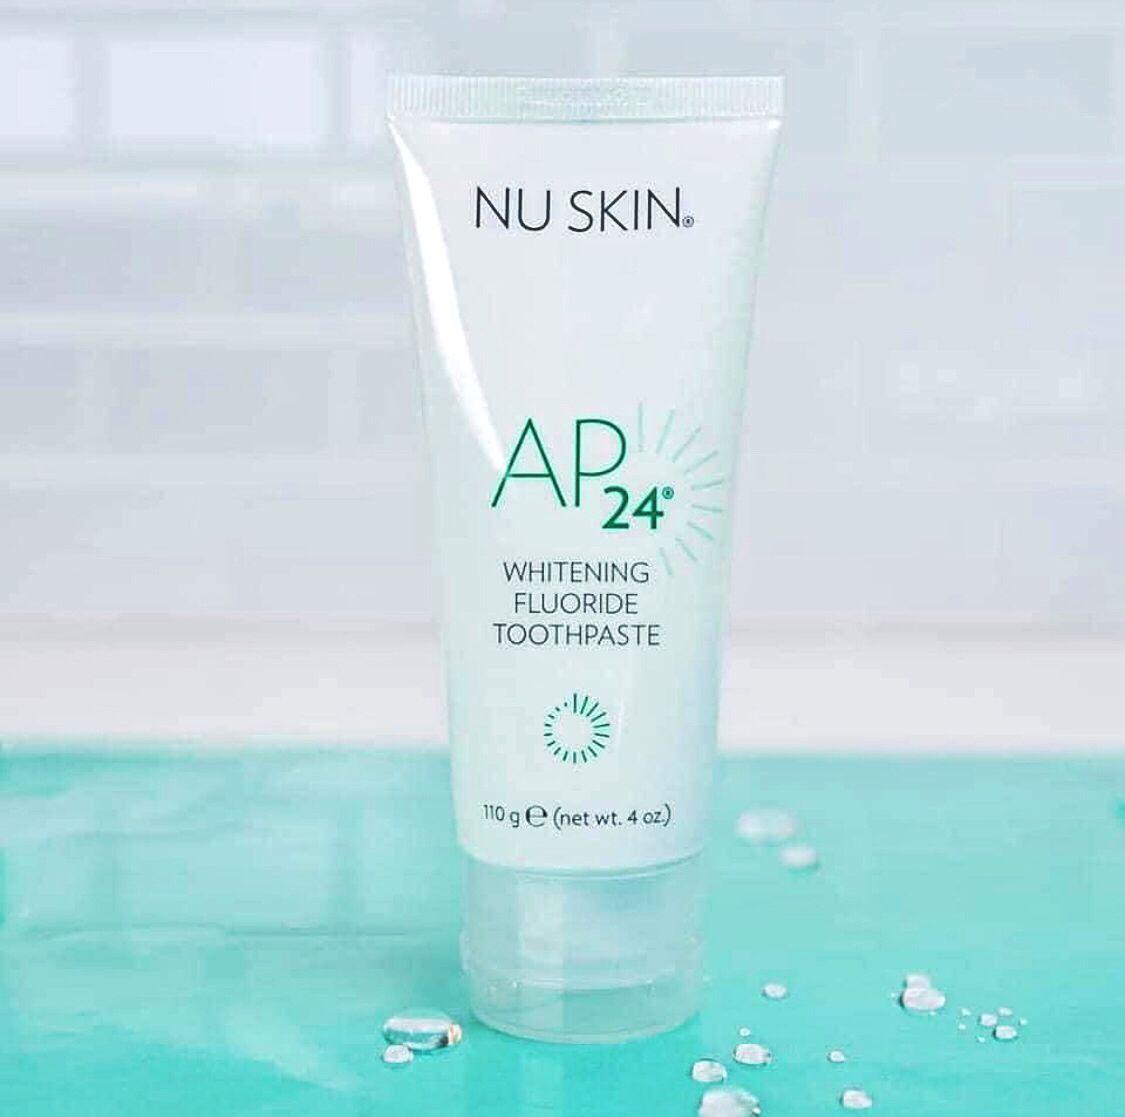 Pin on ap24 whitening fluoride toothpaste wholesale price